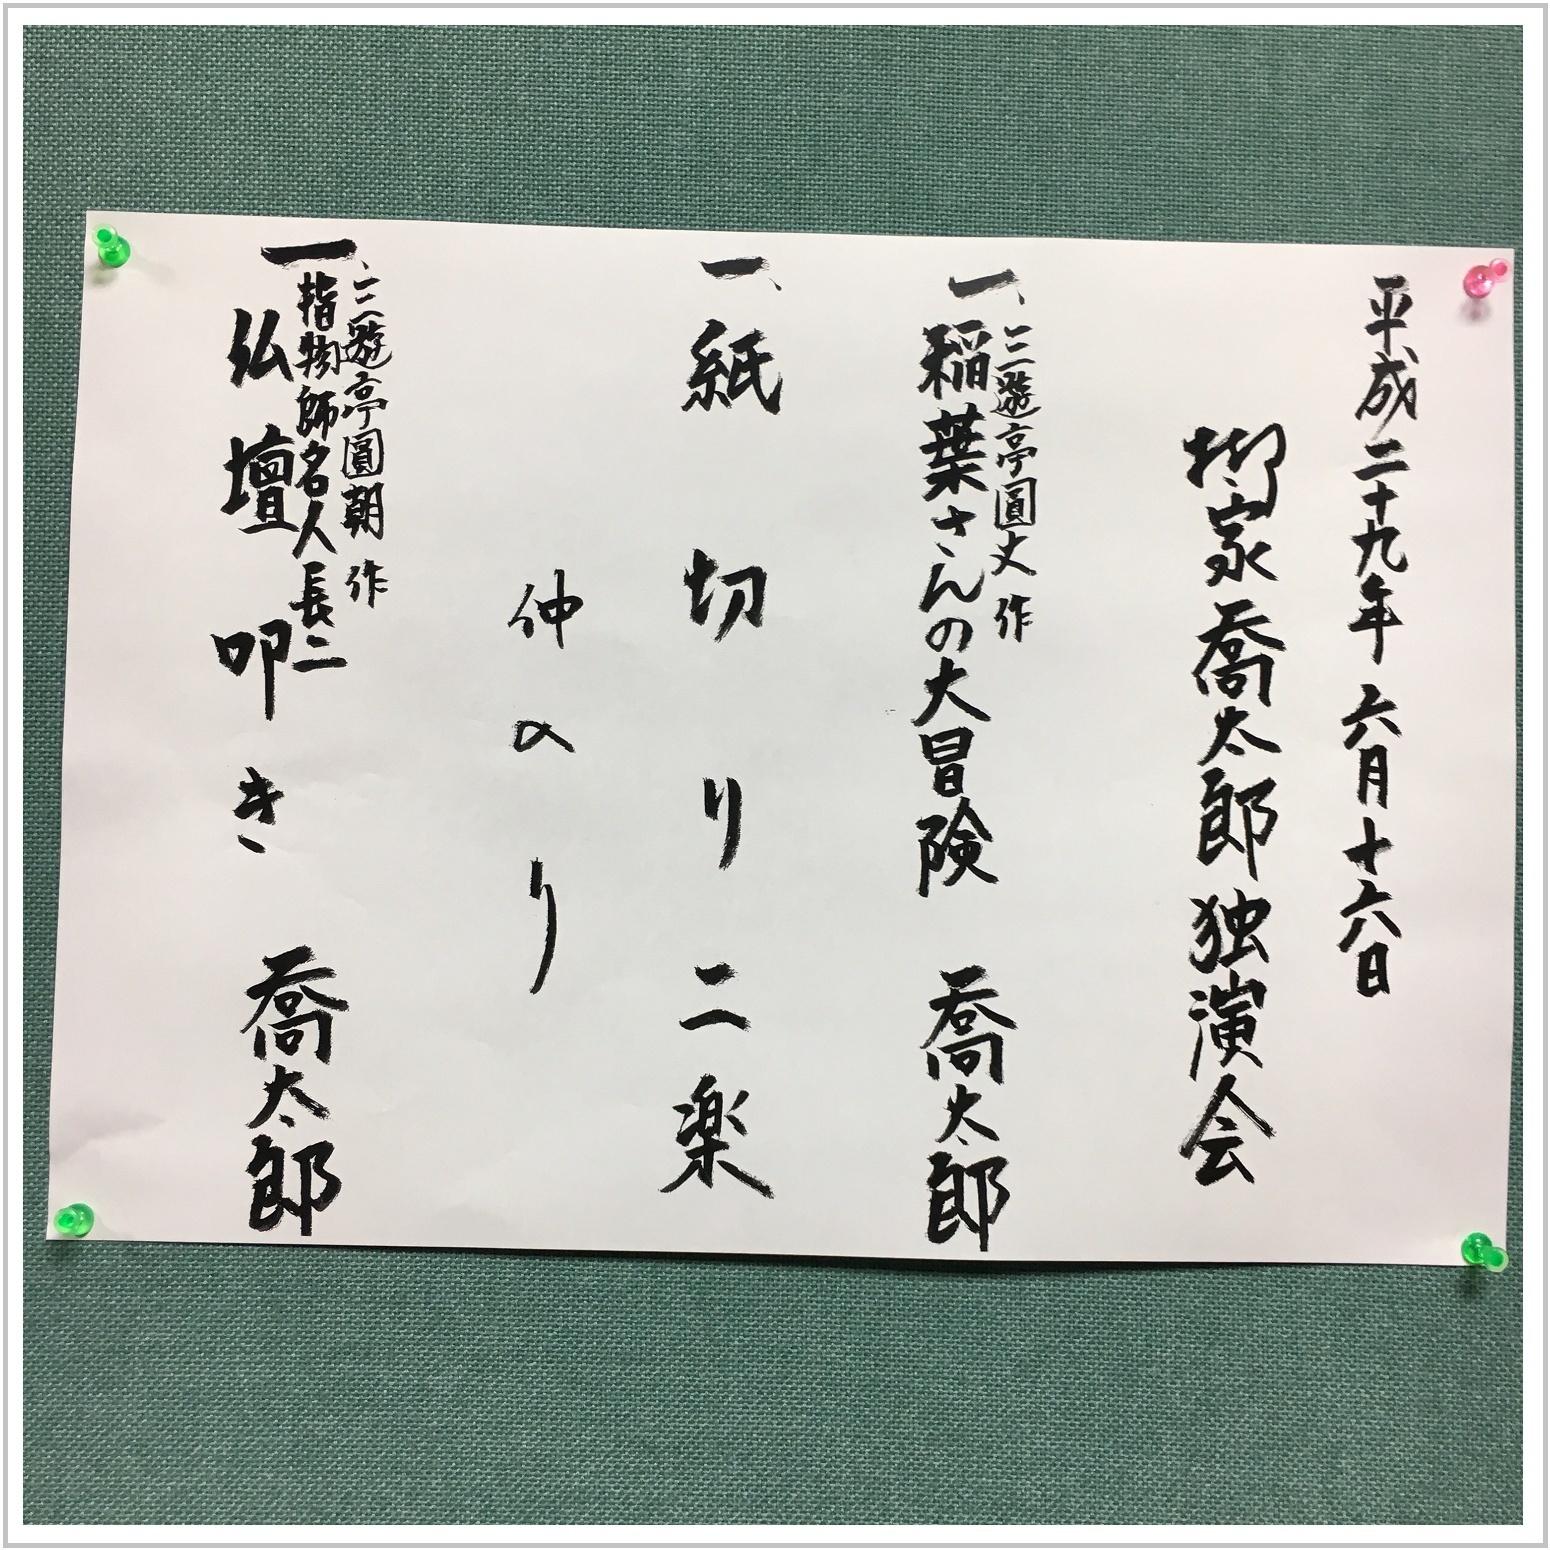 matsuri_7_616.jpg